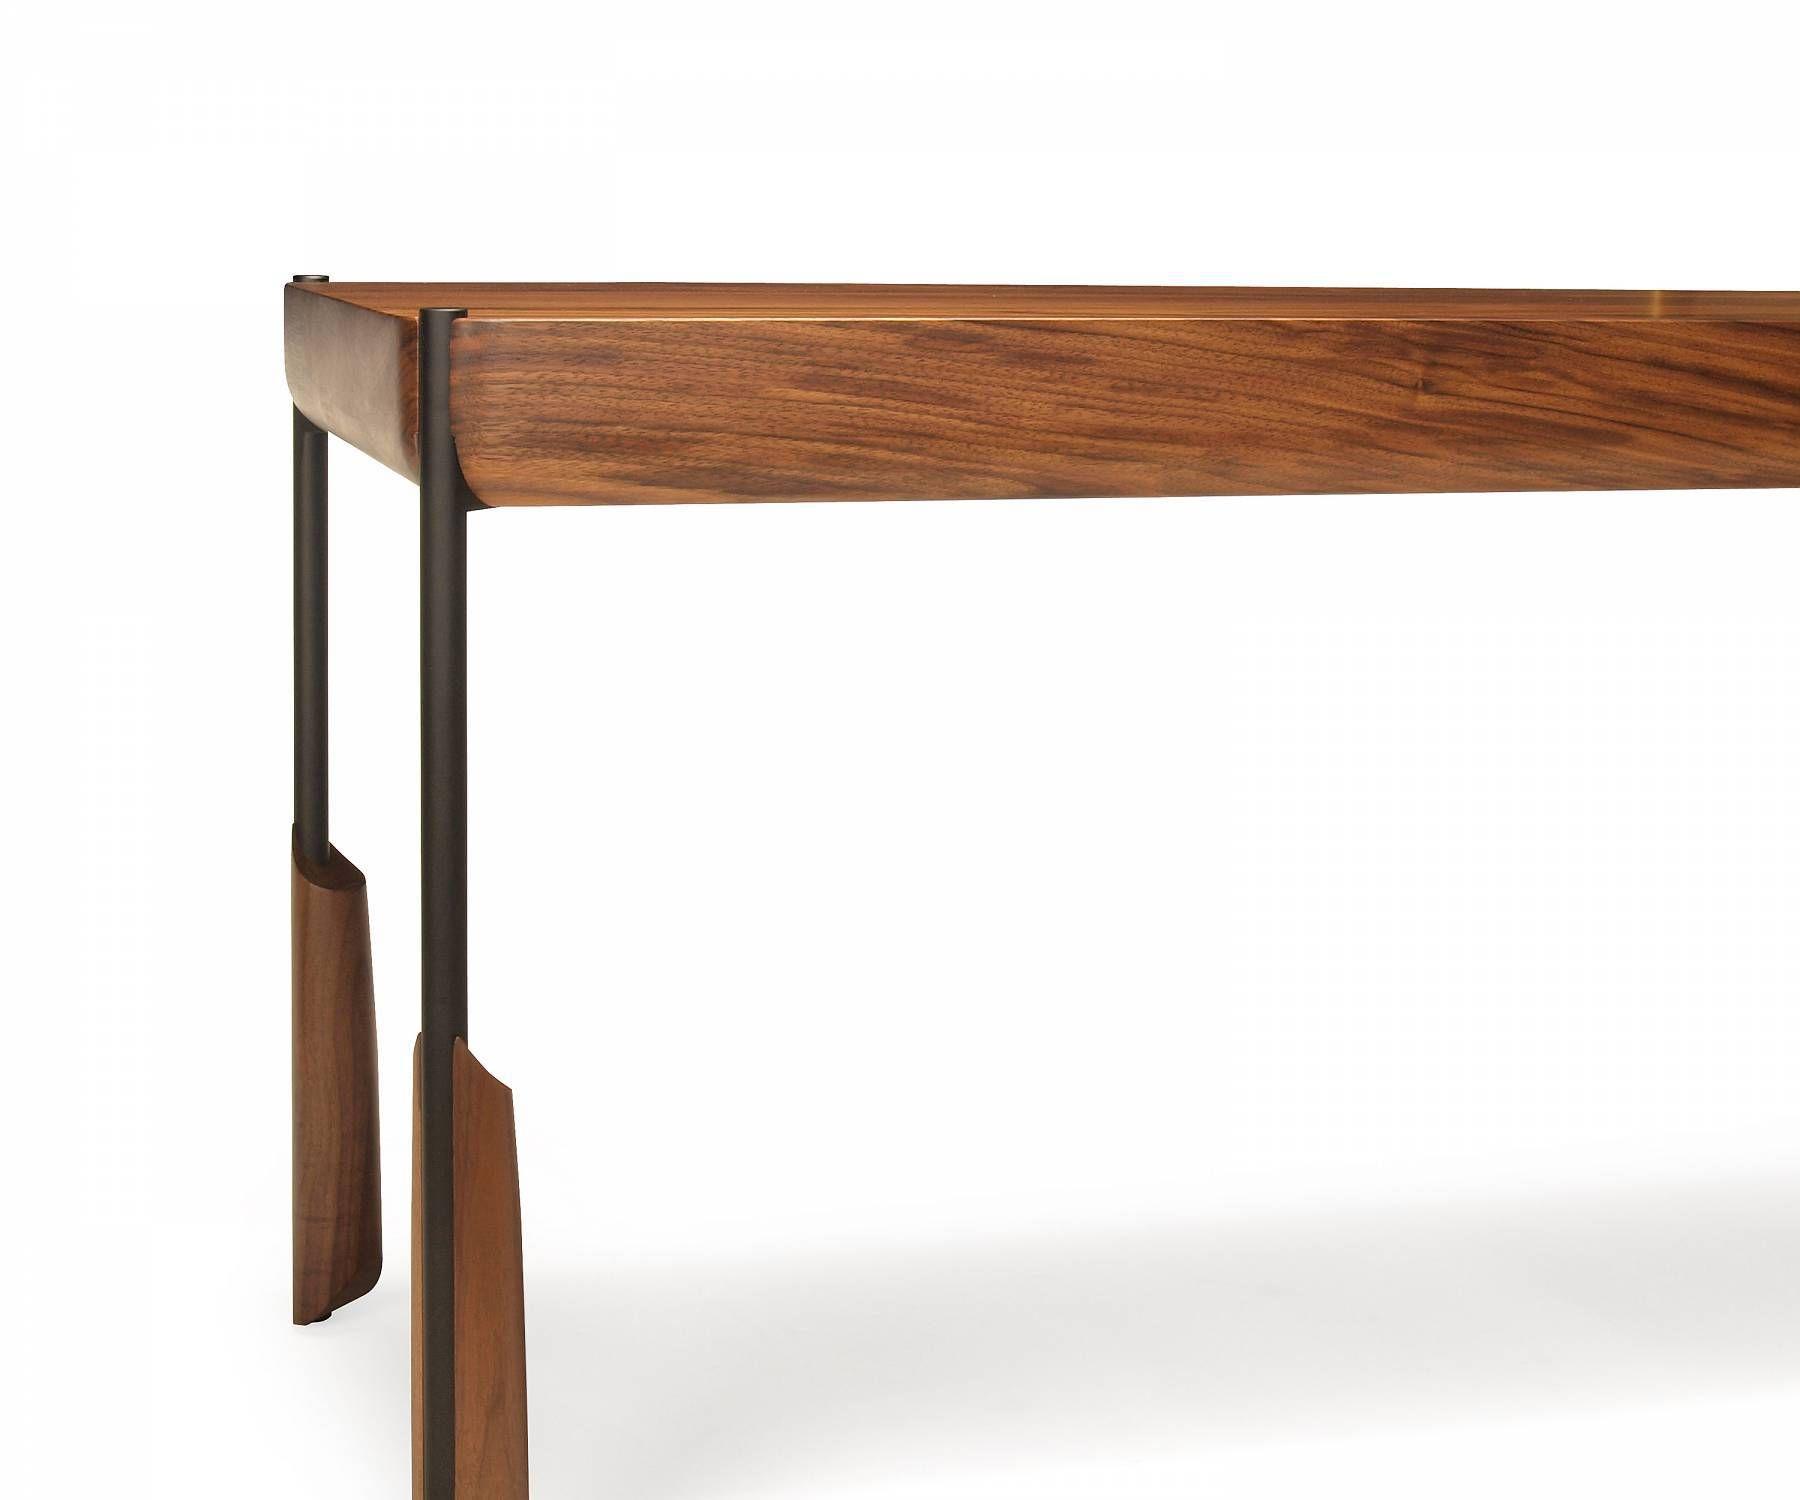 cutting edge furniture. Skram Furniture Company Craft Their Products Using \u0027traditional Techniques \u0026 Cutting-edge Fabrication\u0027 Cutting Edge E